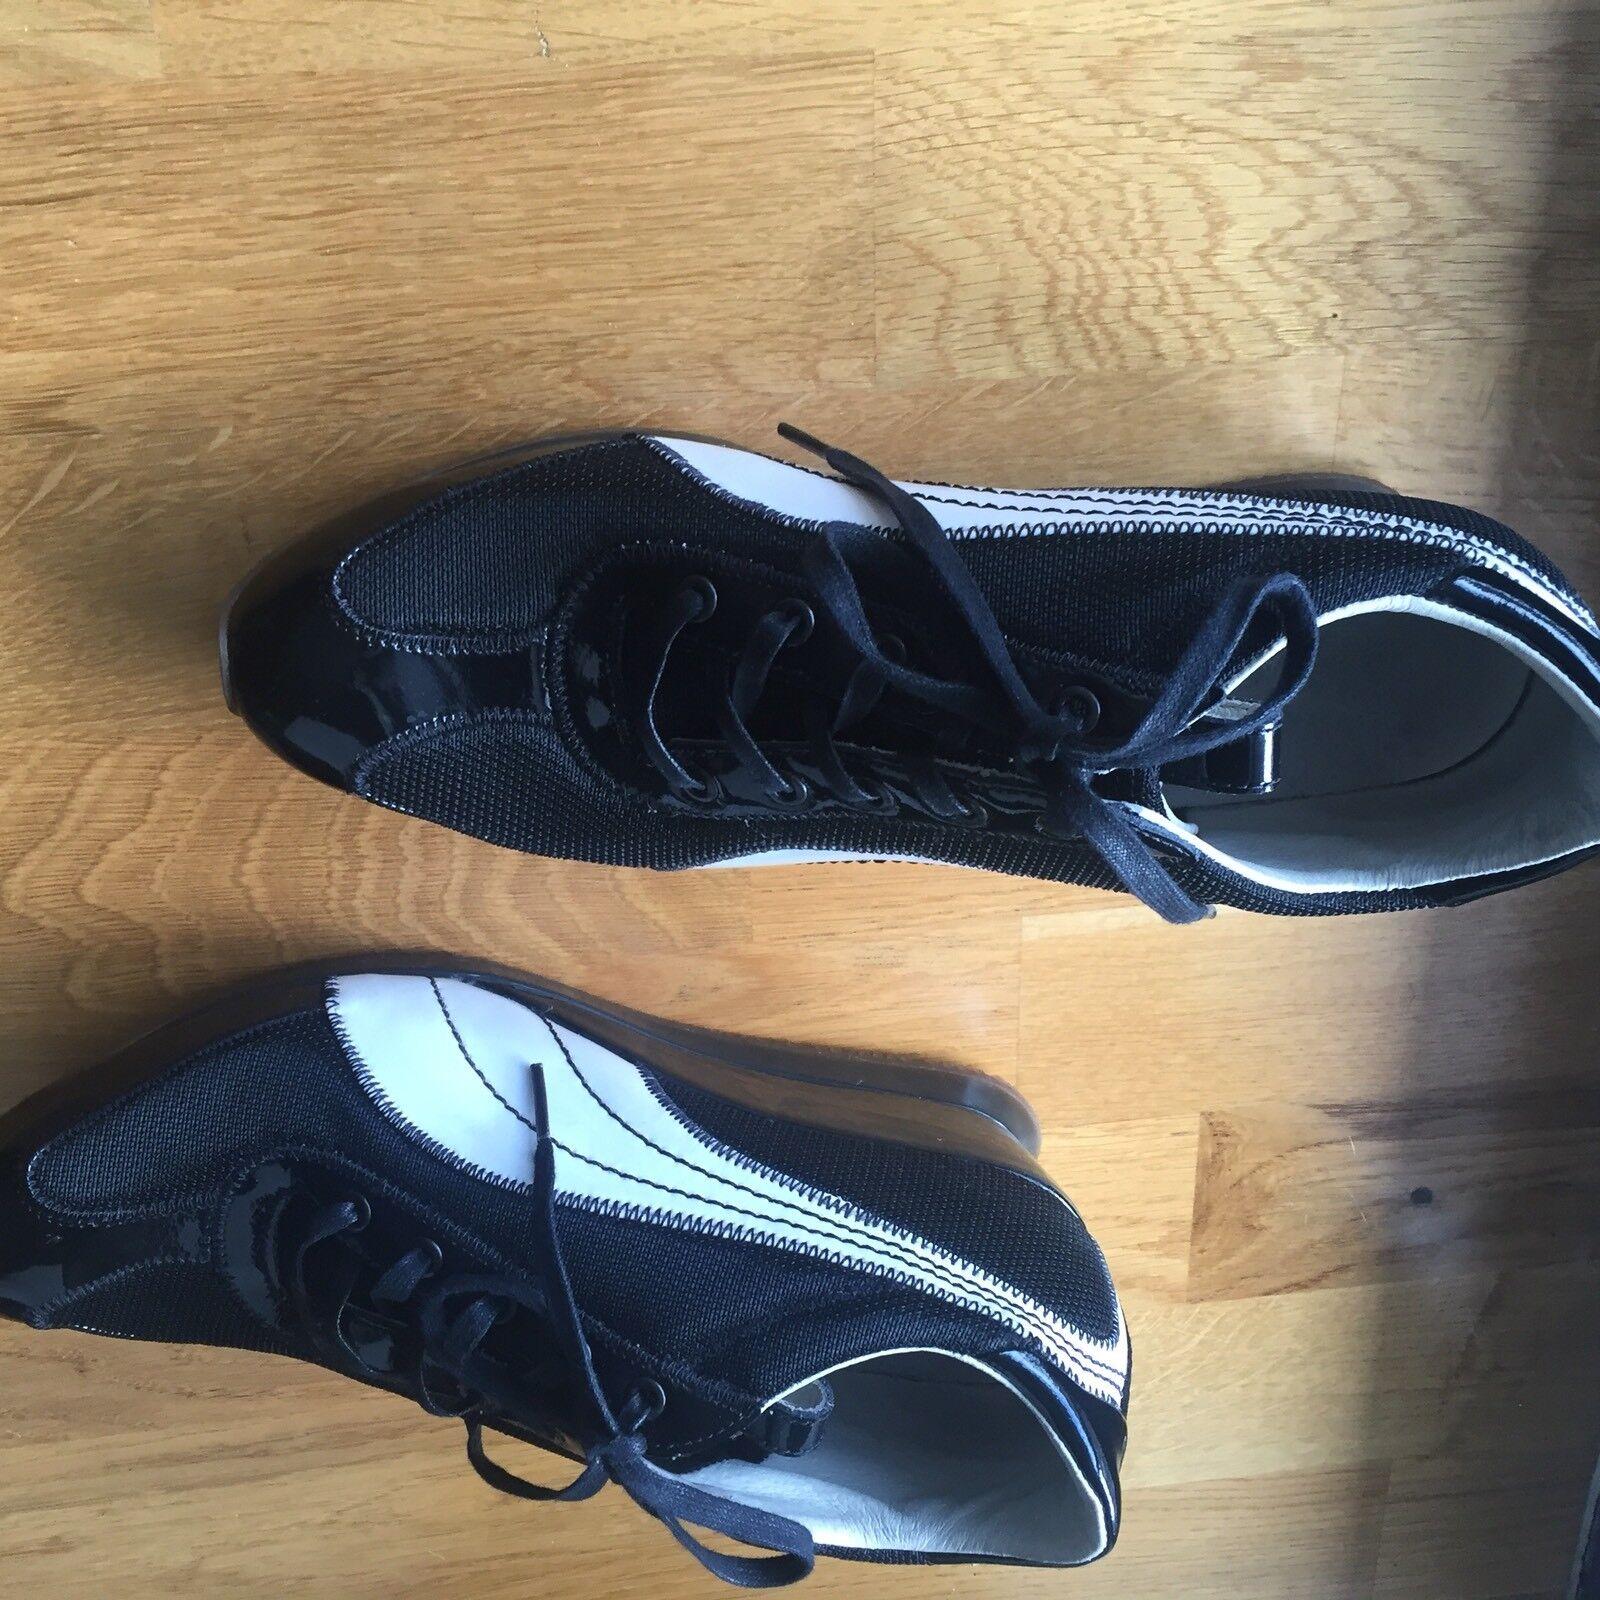 RARE Schuhe PUMA BLACK LABEL WMN Schuhe RARE US9 Ferro Tessuto Heels 75fab2